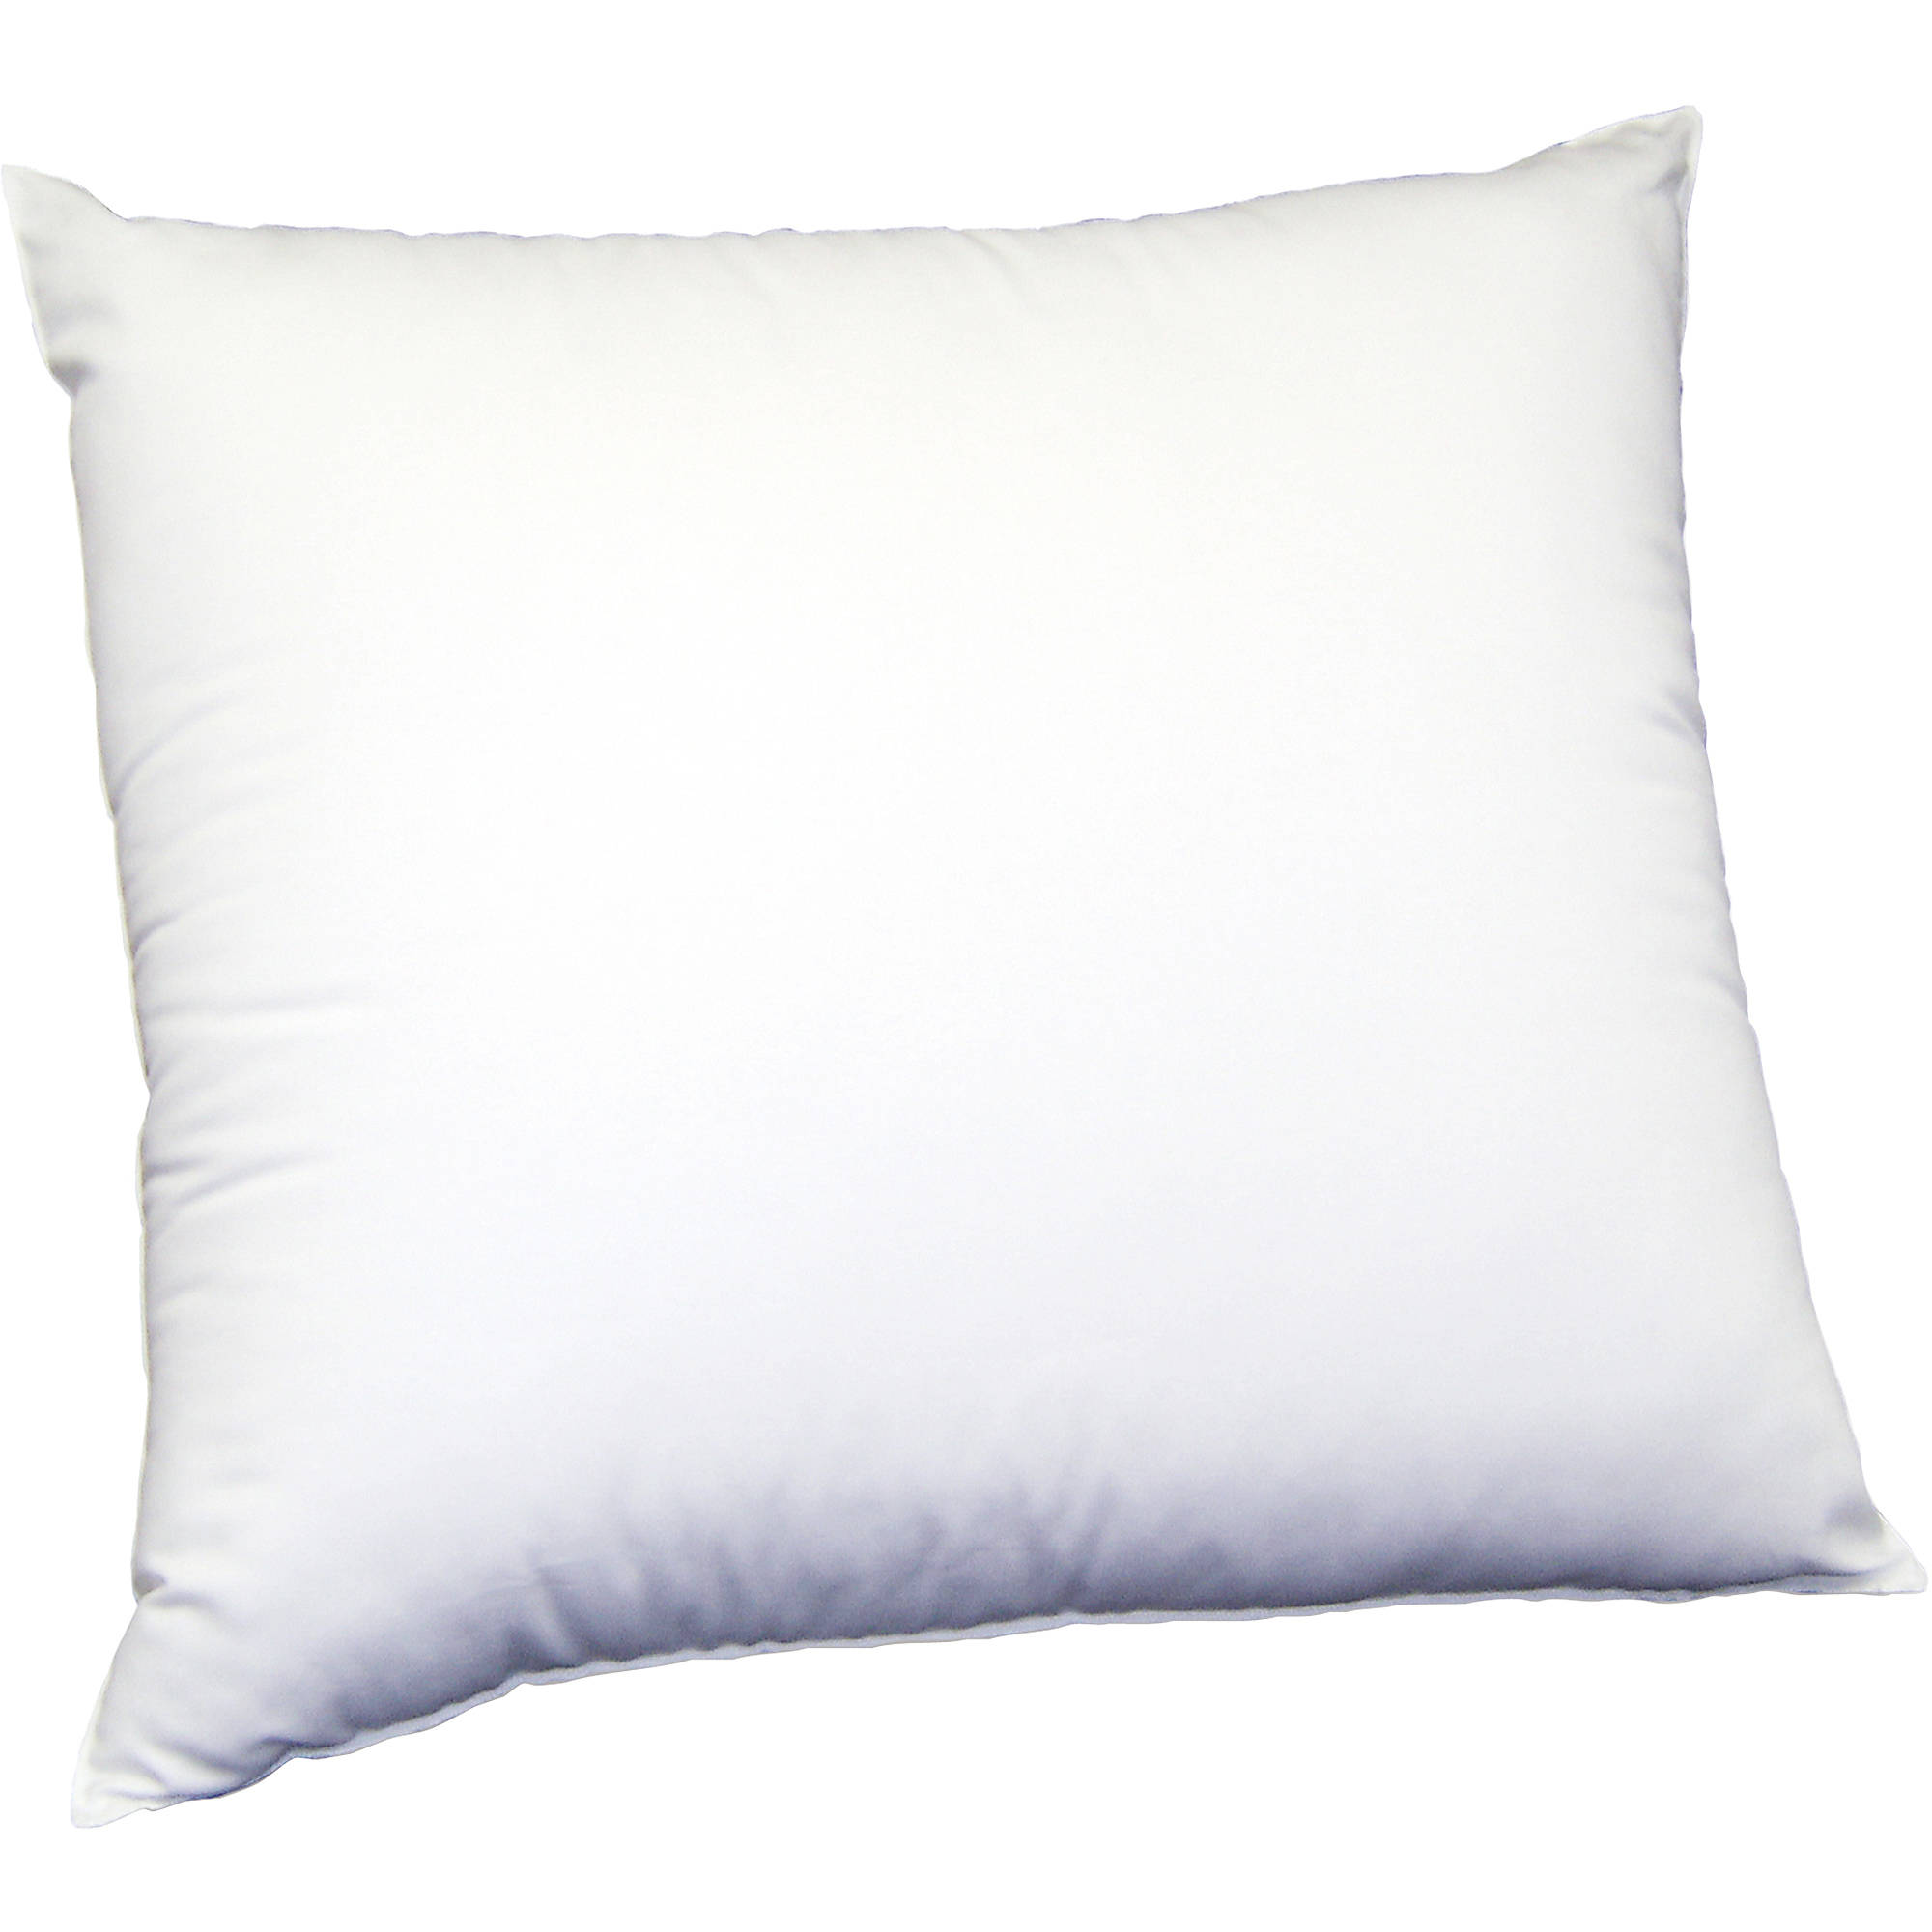 Beautyrest Euro Pillow for Square Decorative Shams